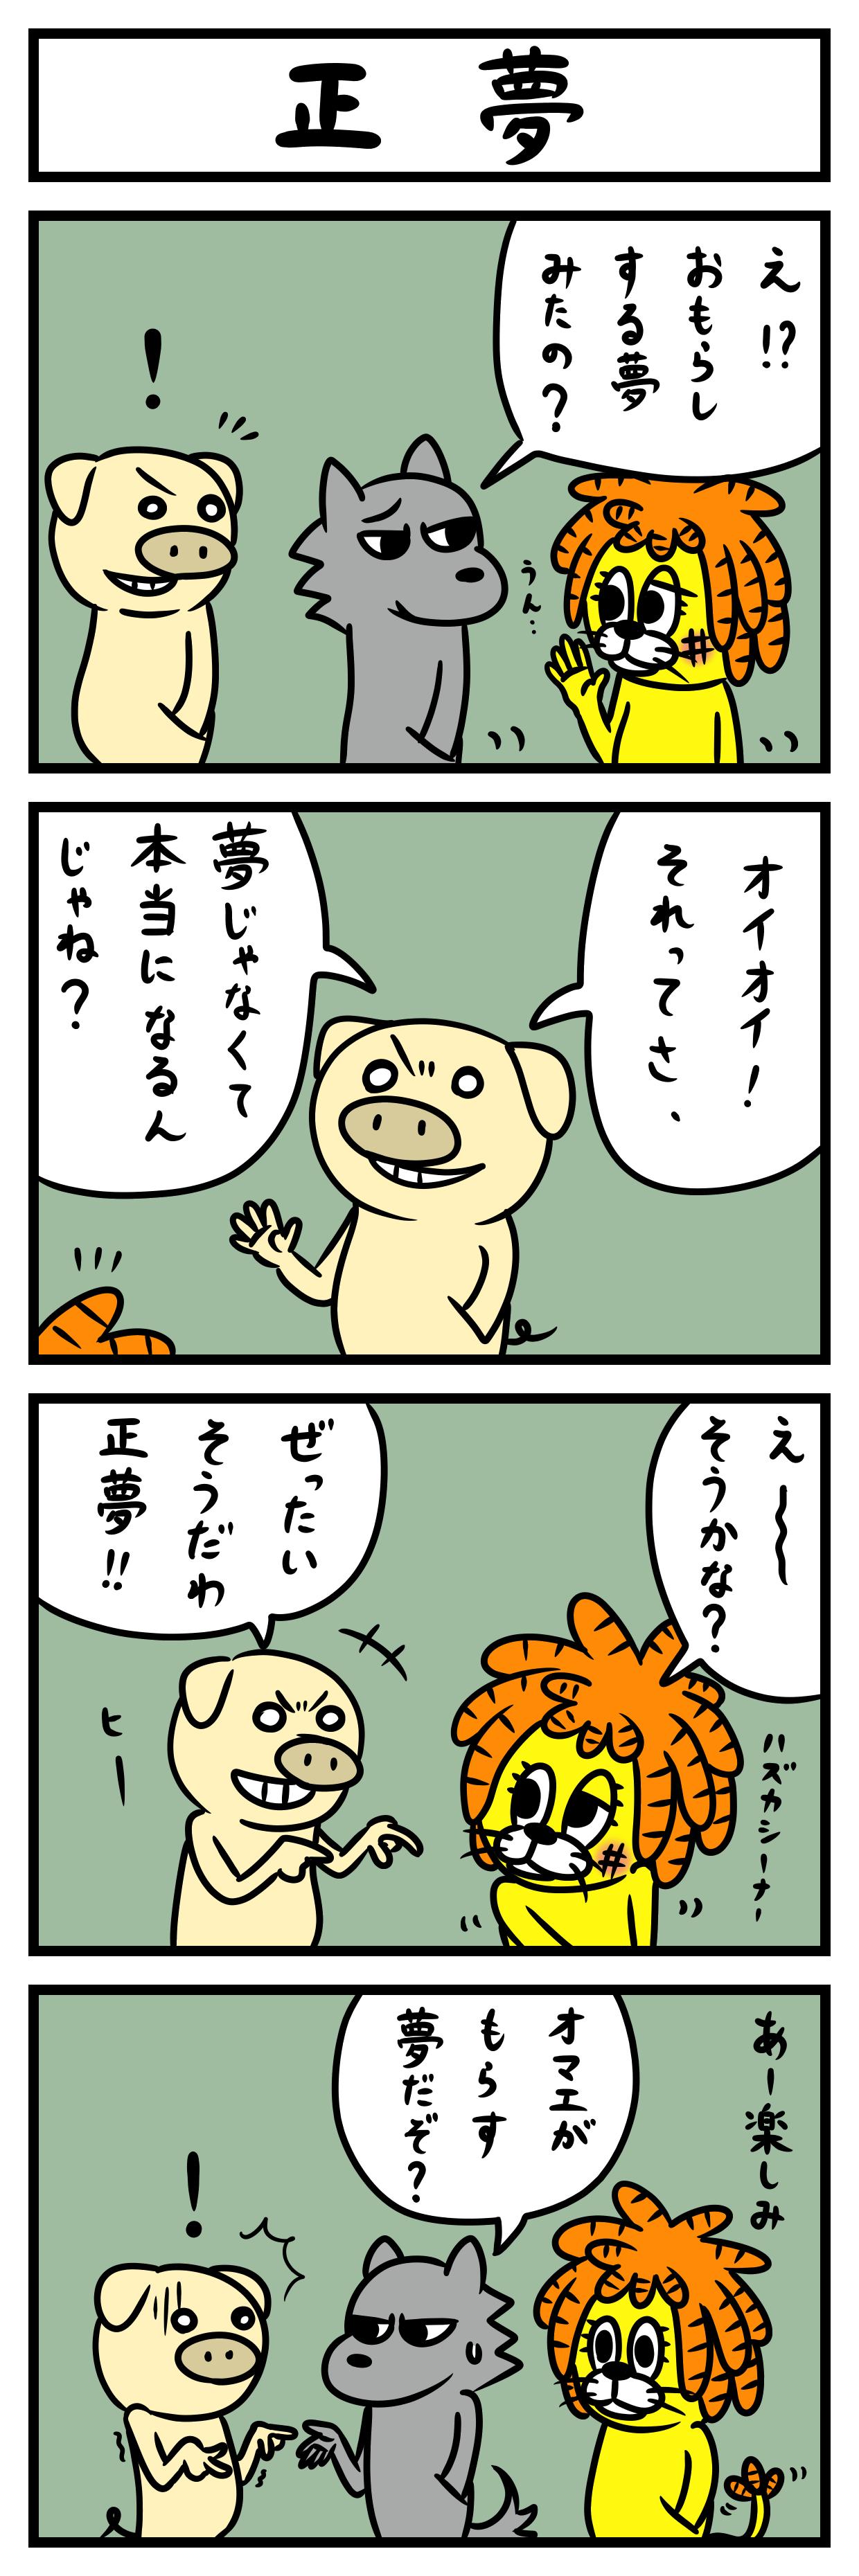 4koma097正夢